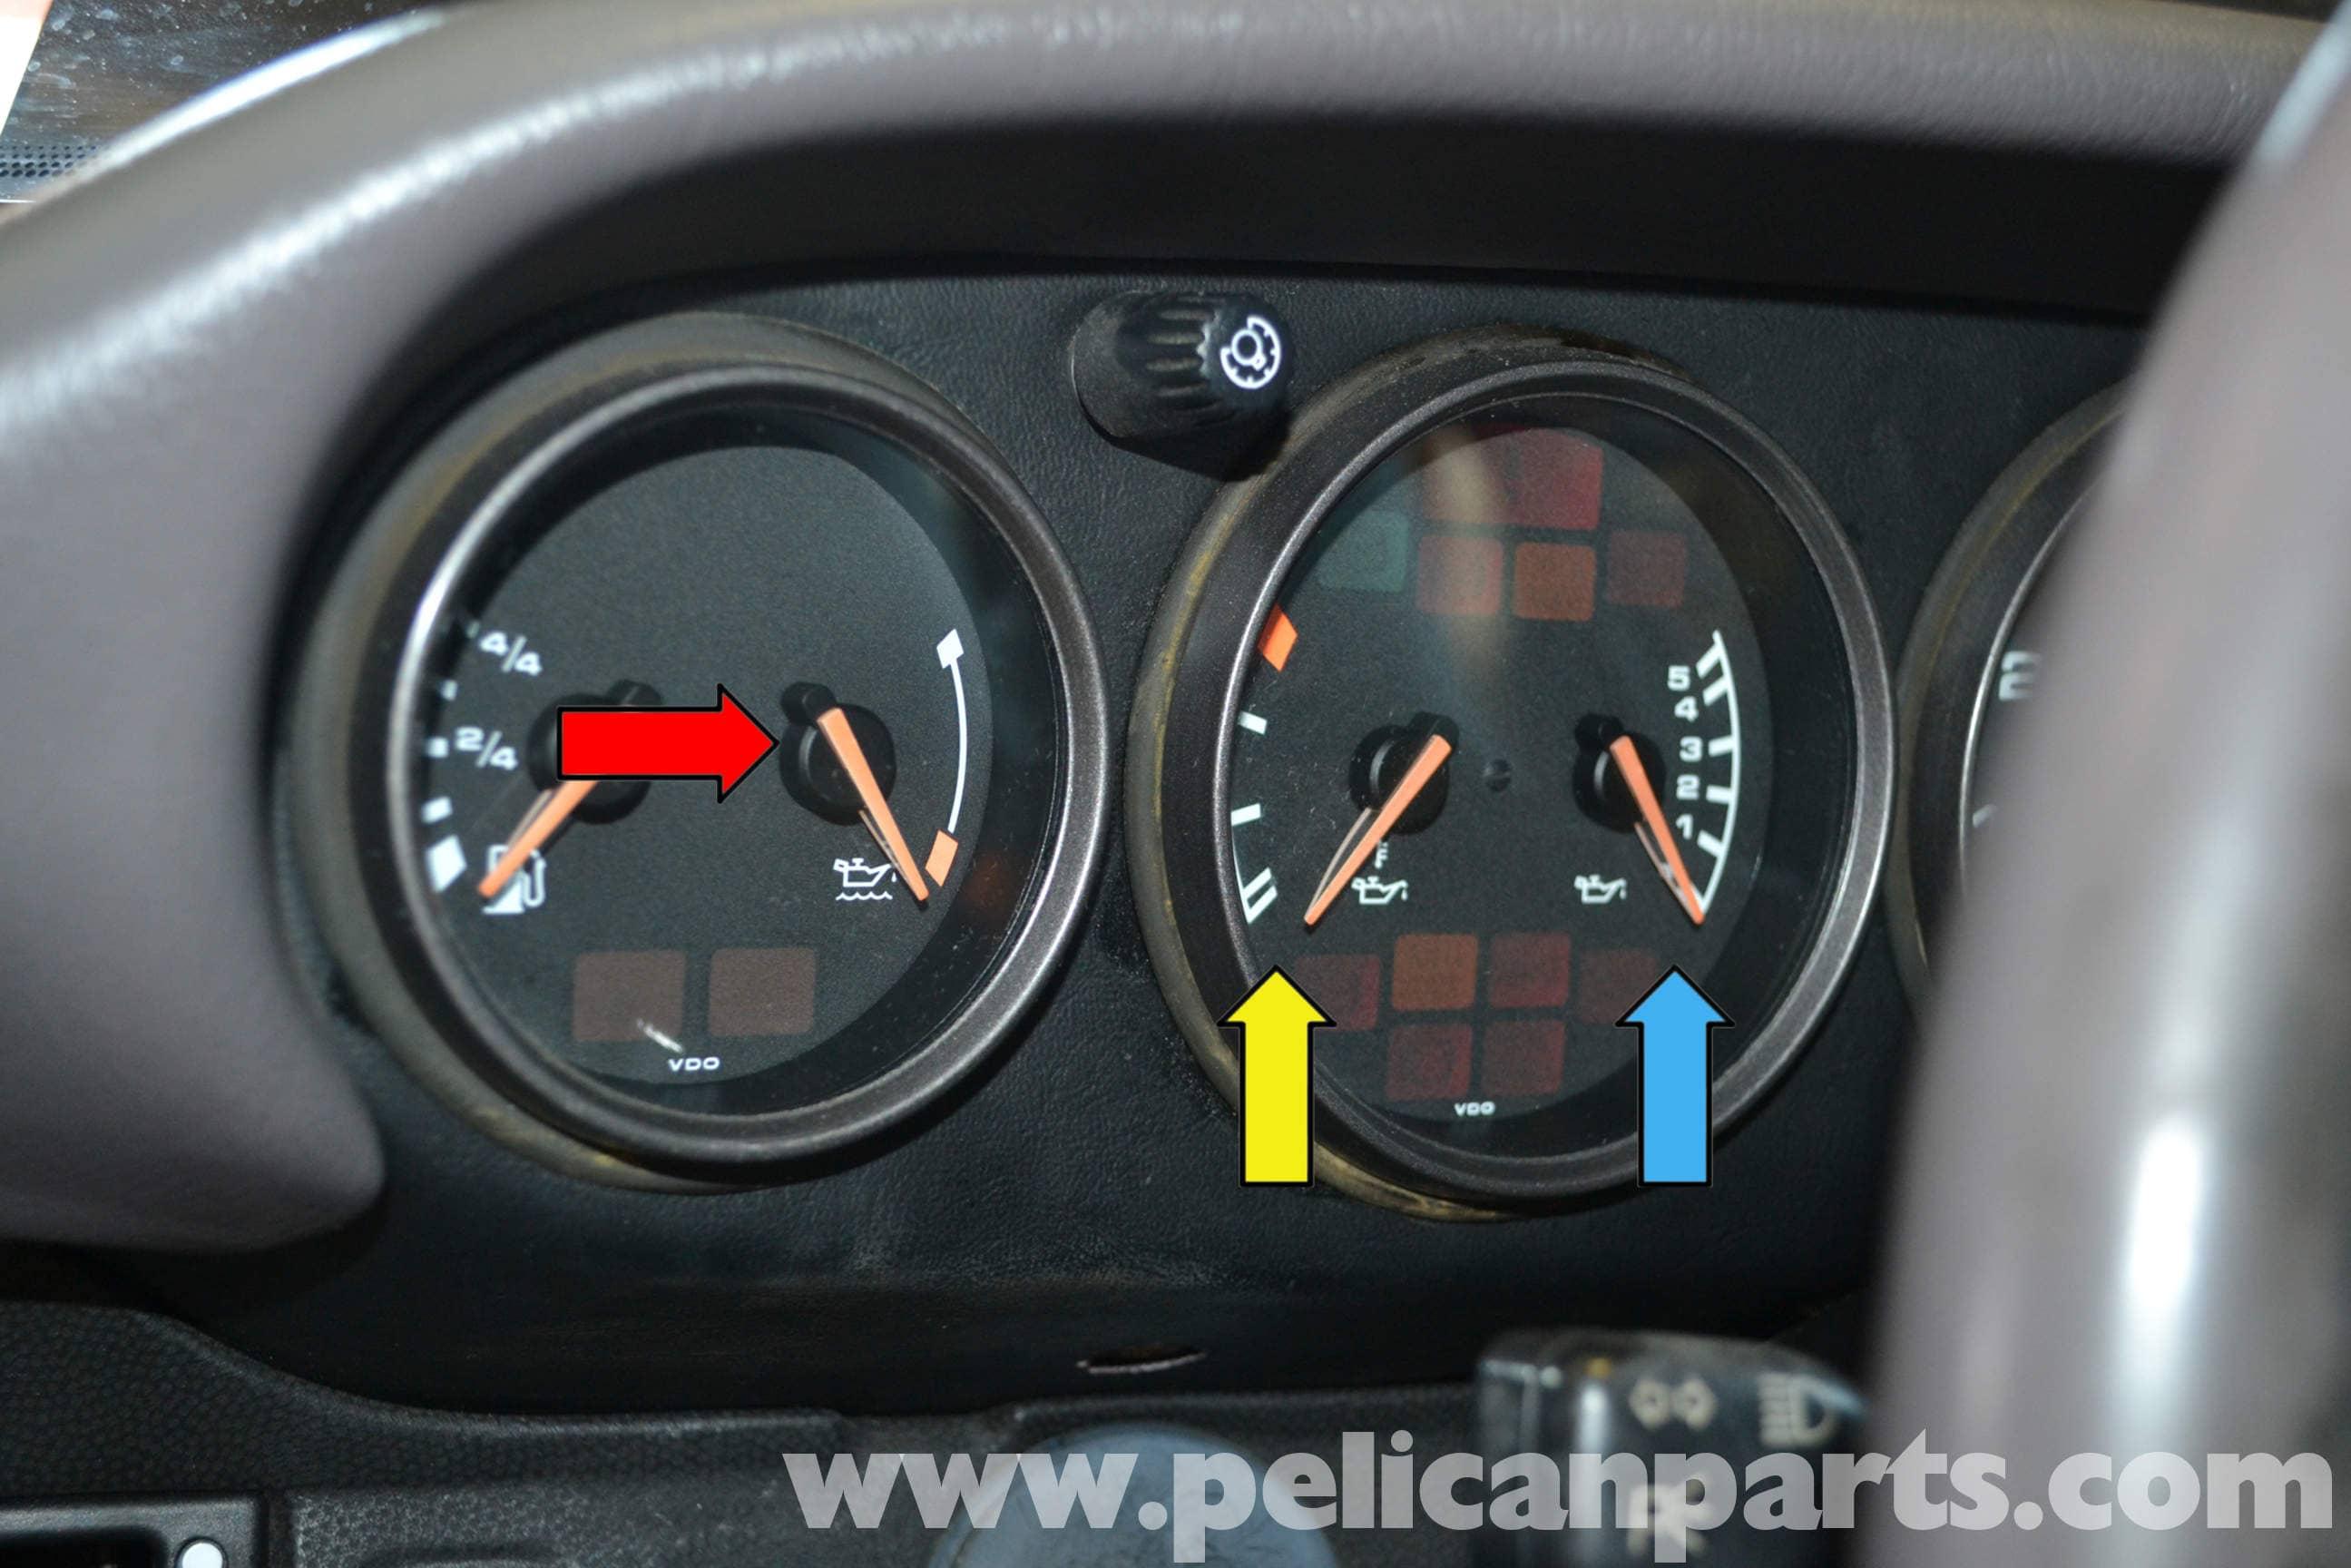 Pelican Technical Article Porsche 993 Understanding Your Oil Varioram Engine Diagram Large Image Extra